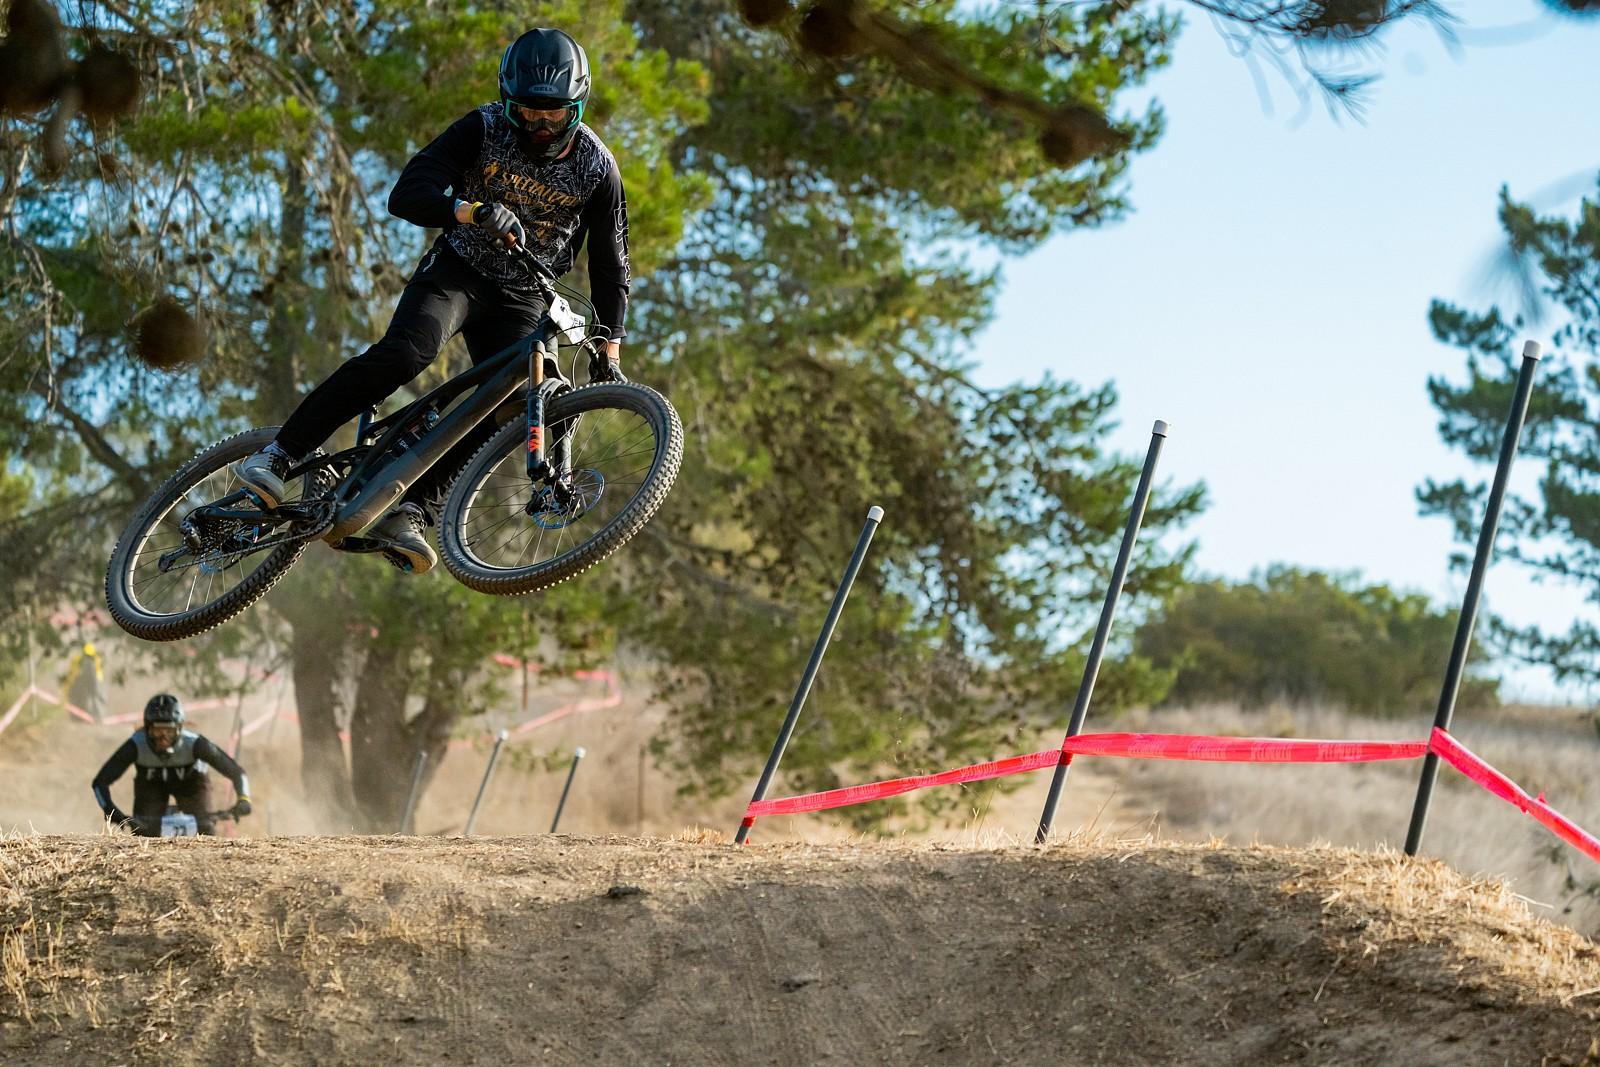 Jake Keller? - Zuestman - Mountain Biking Pictures - Vital MTB